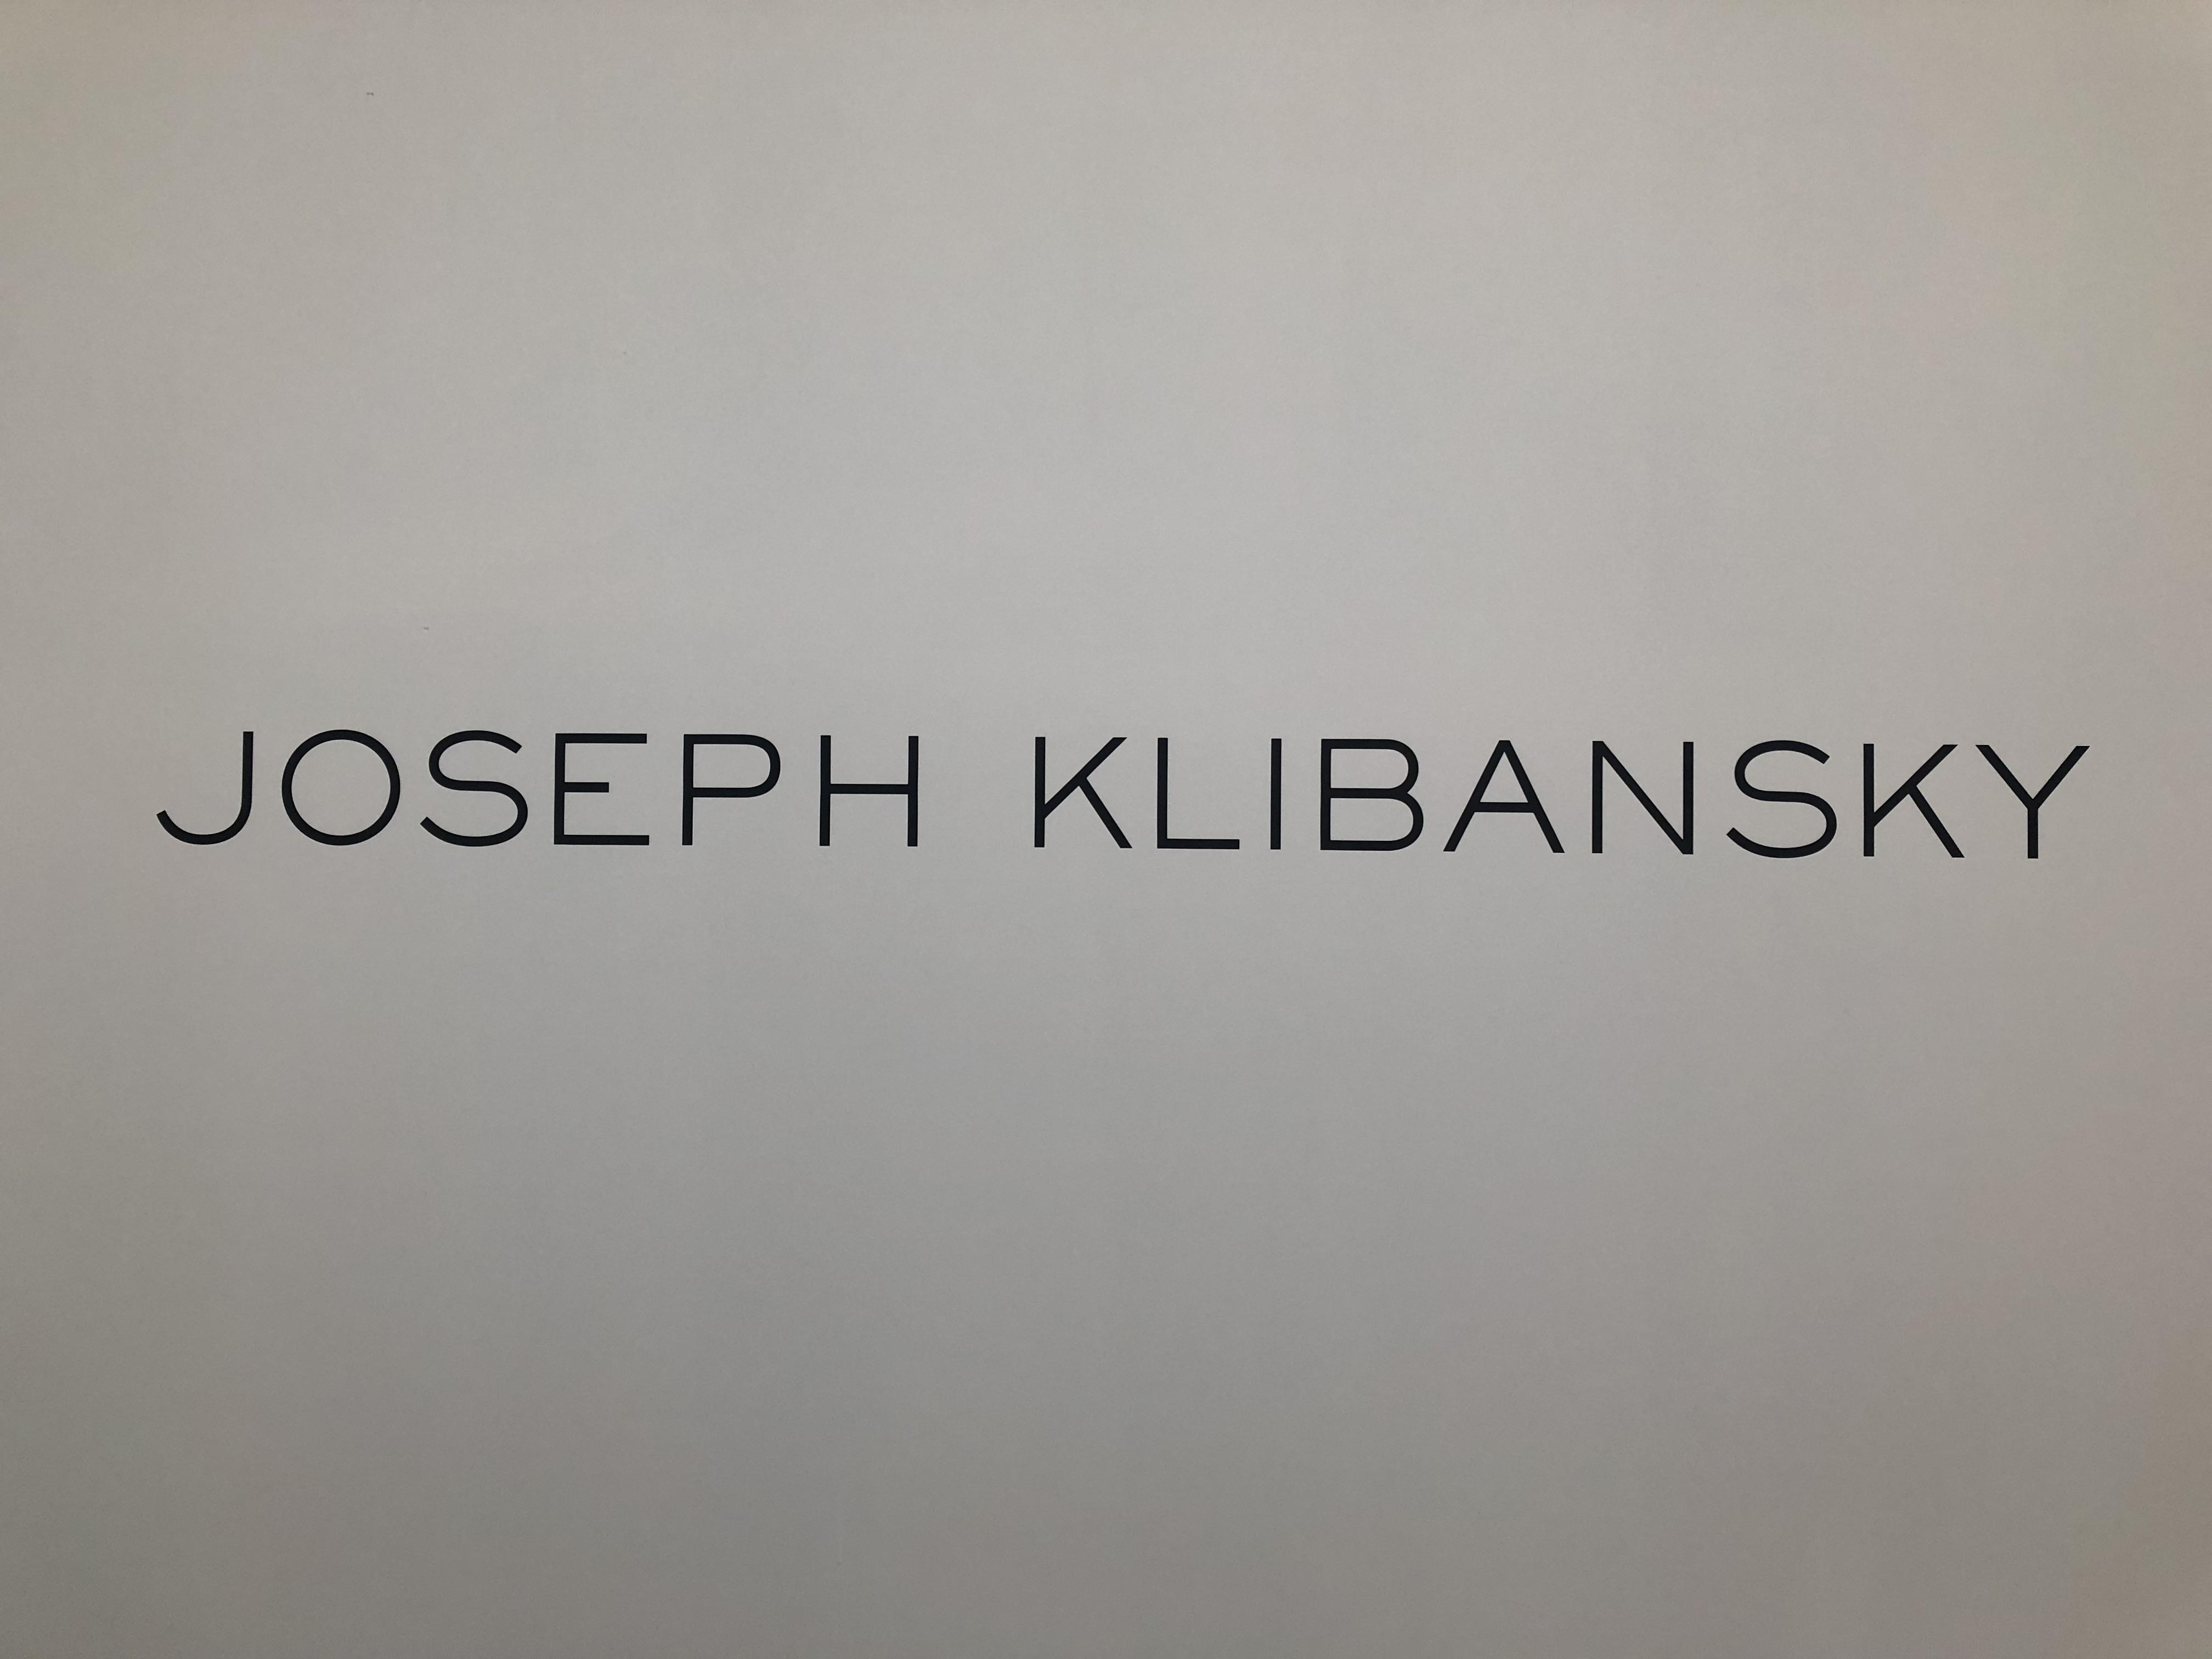 Joseph KliBanksy Brand Store 2018